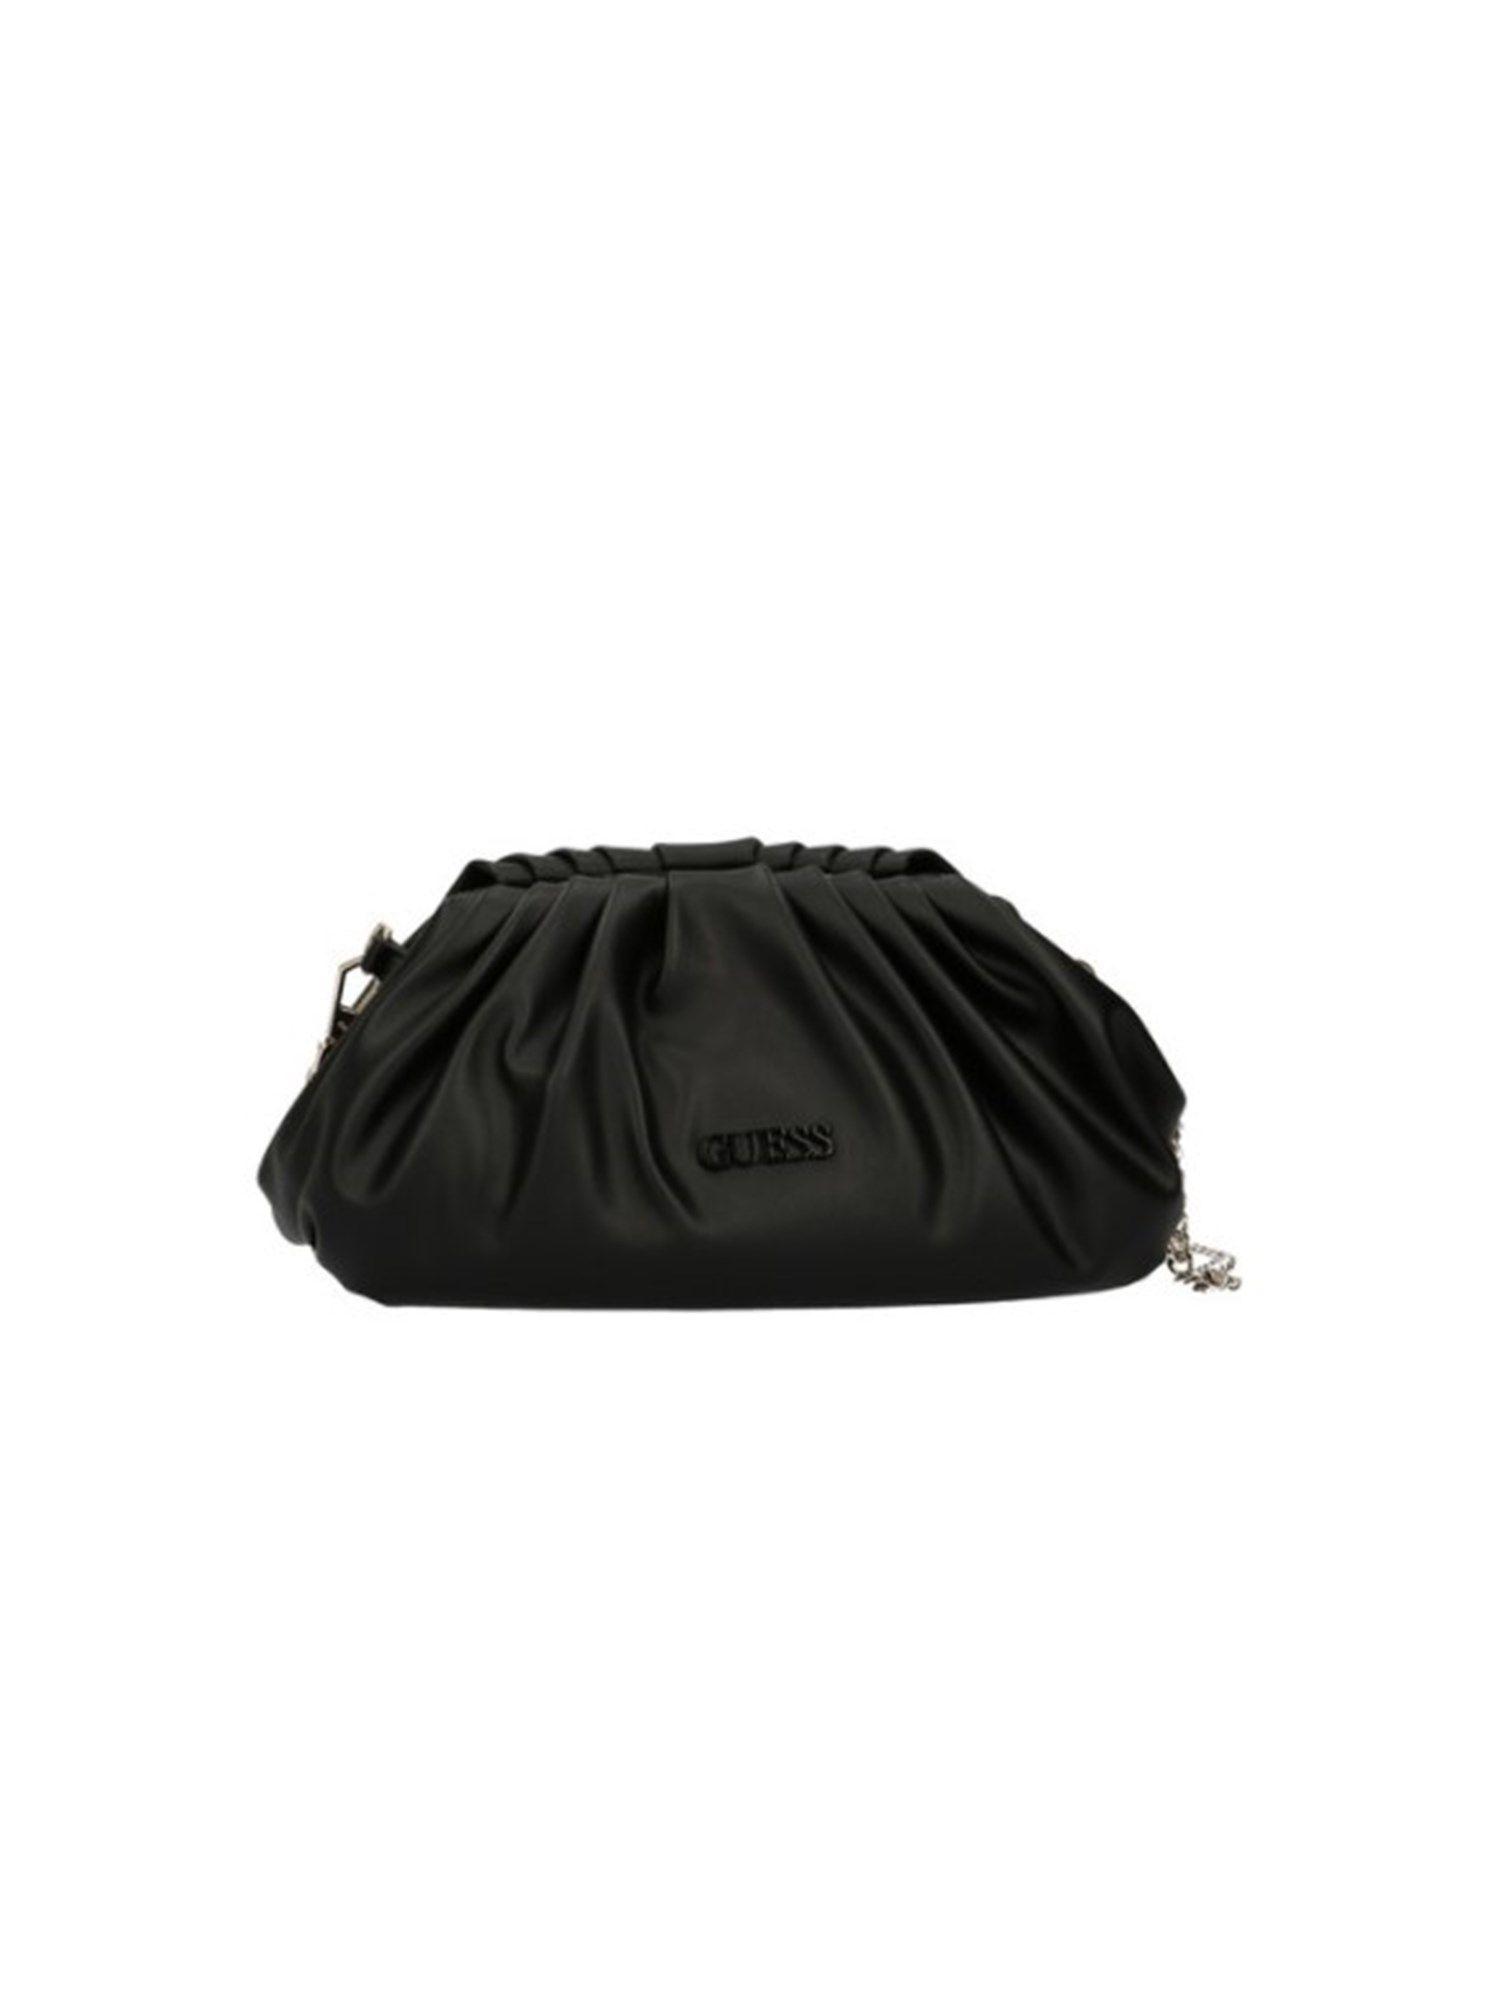 Guess GUESS WOMEN'S BLACK LEATHER SHOULDER BAG